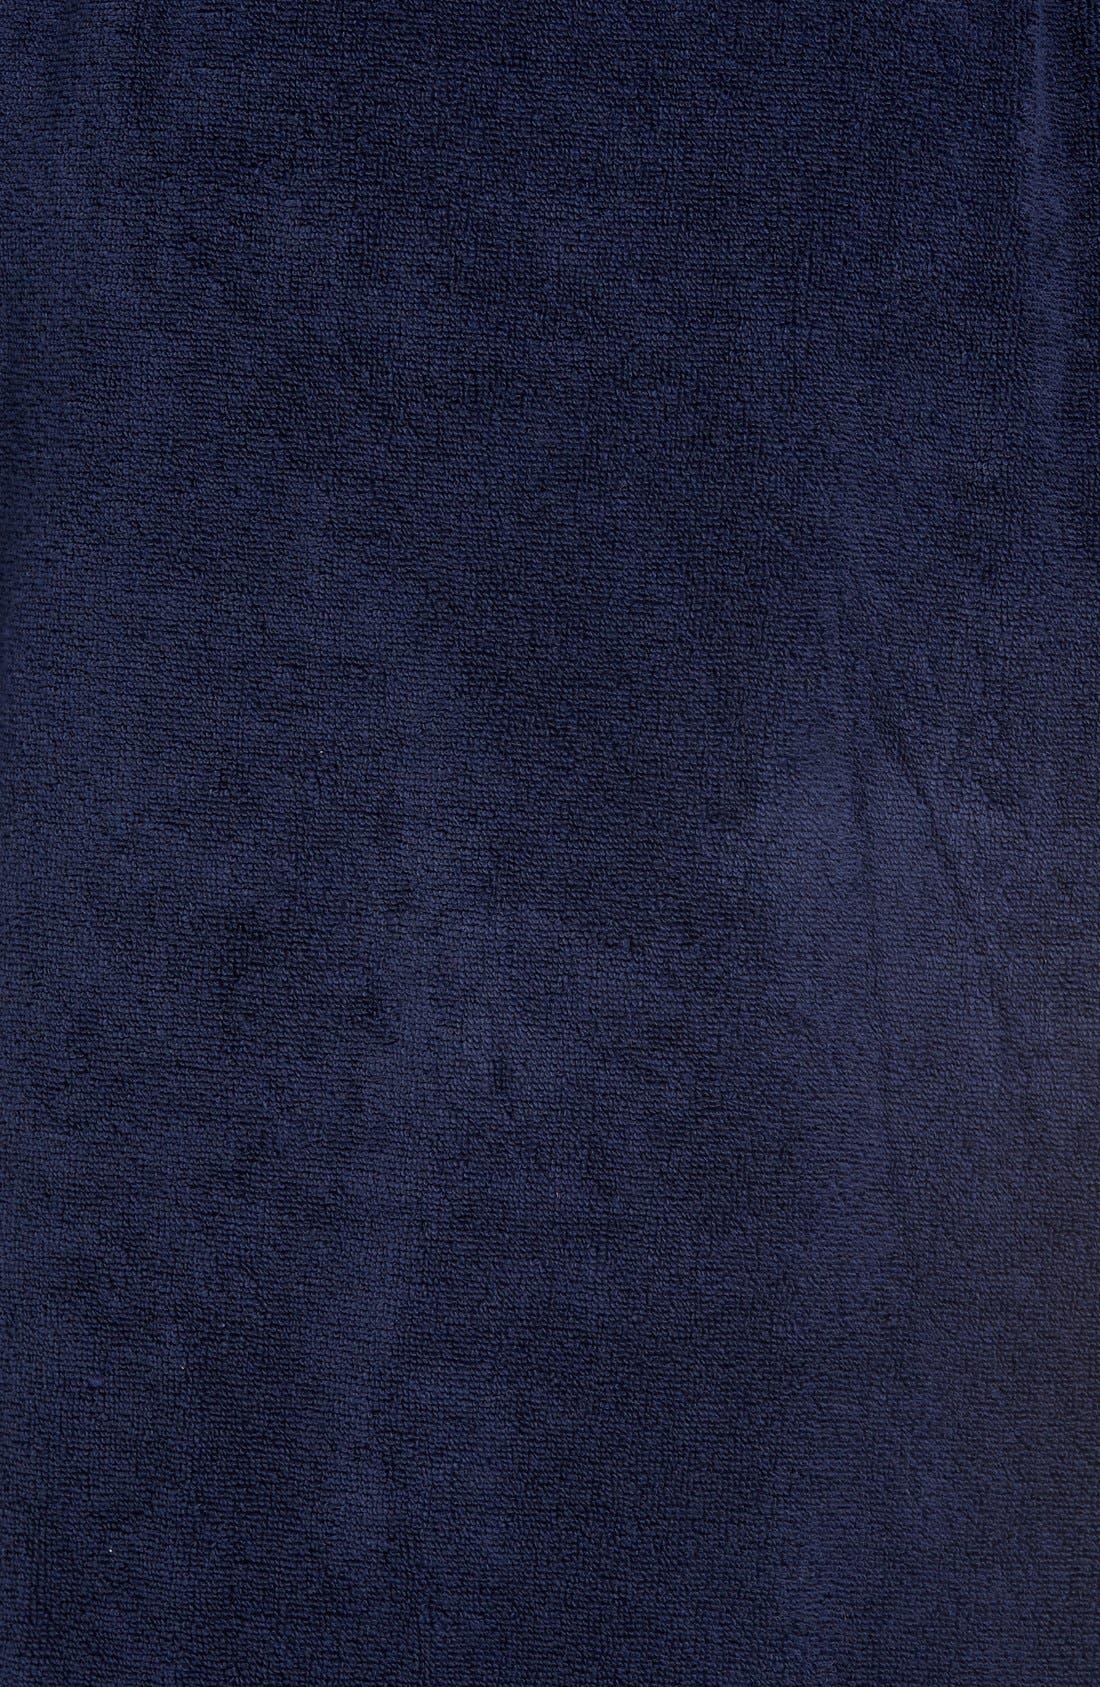 Hydro Cotton Terry Robe,                             Alternate thumbnail 9, color,                             NAVY